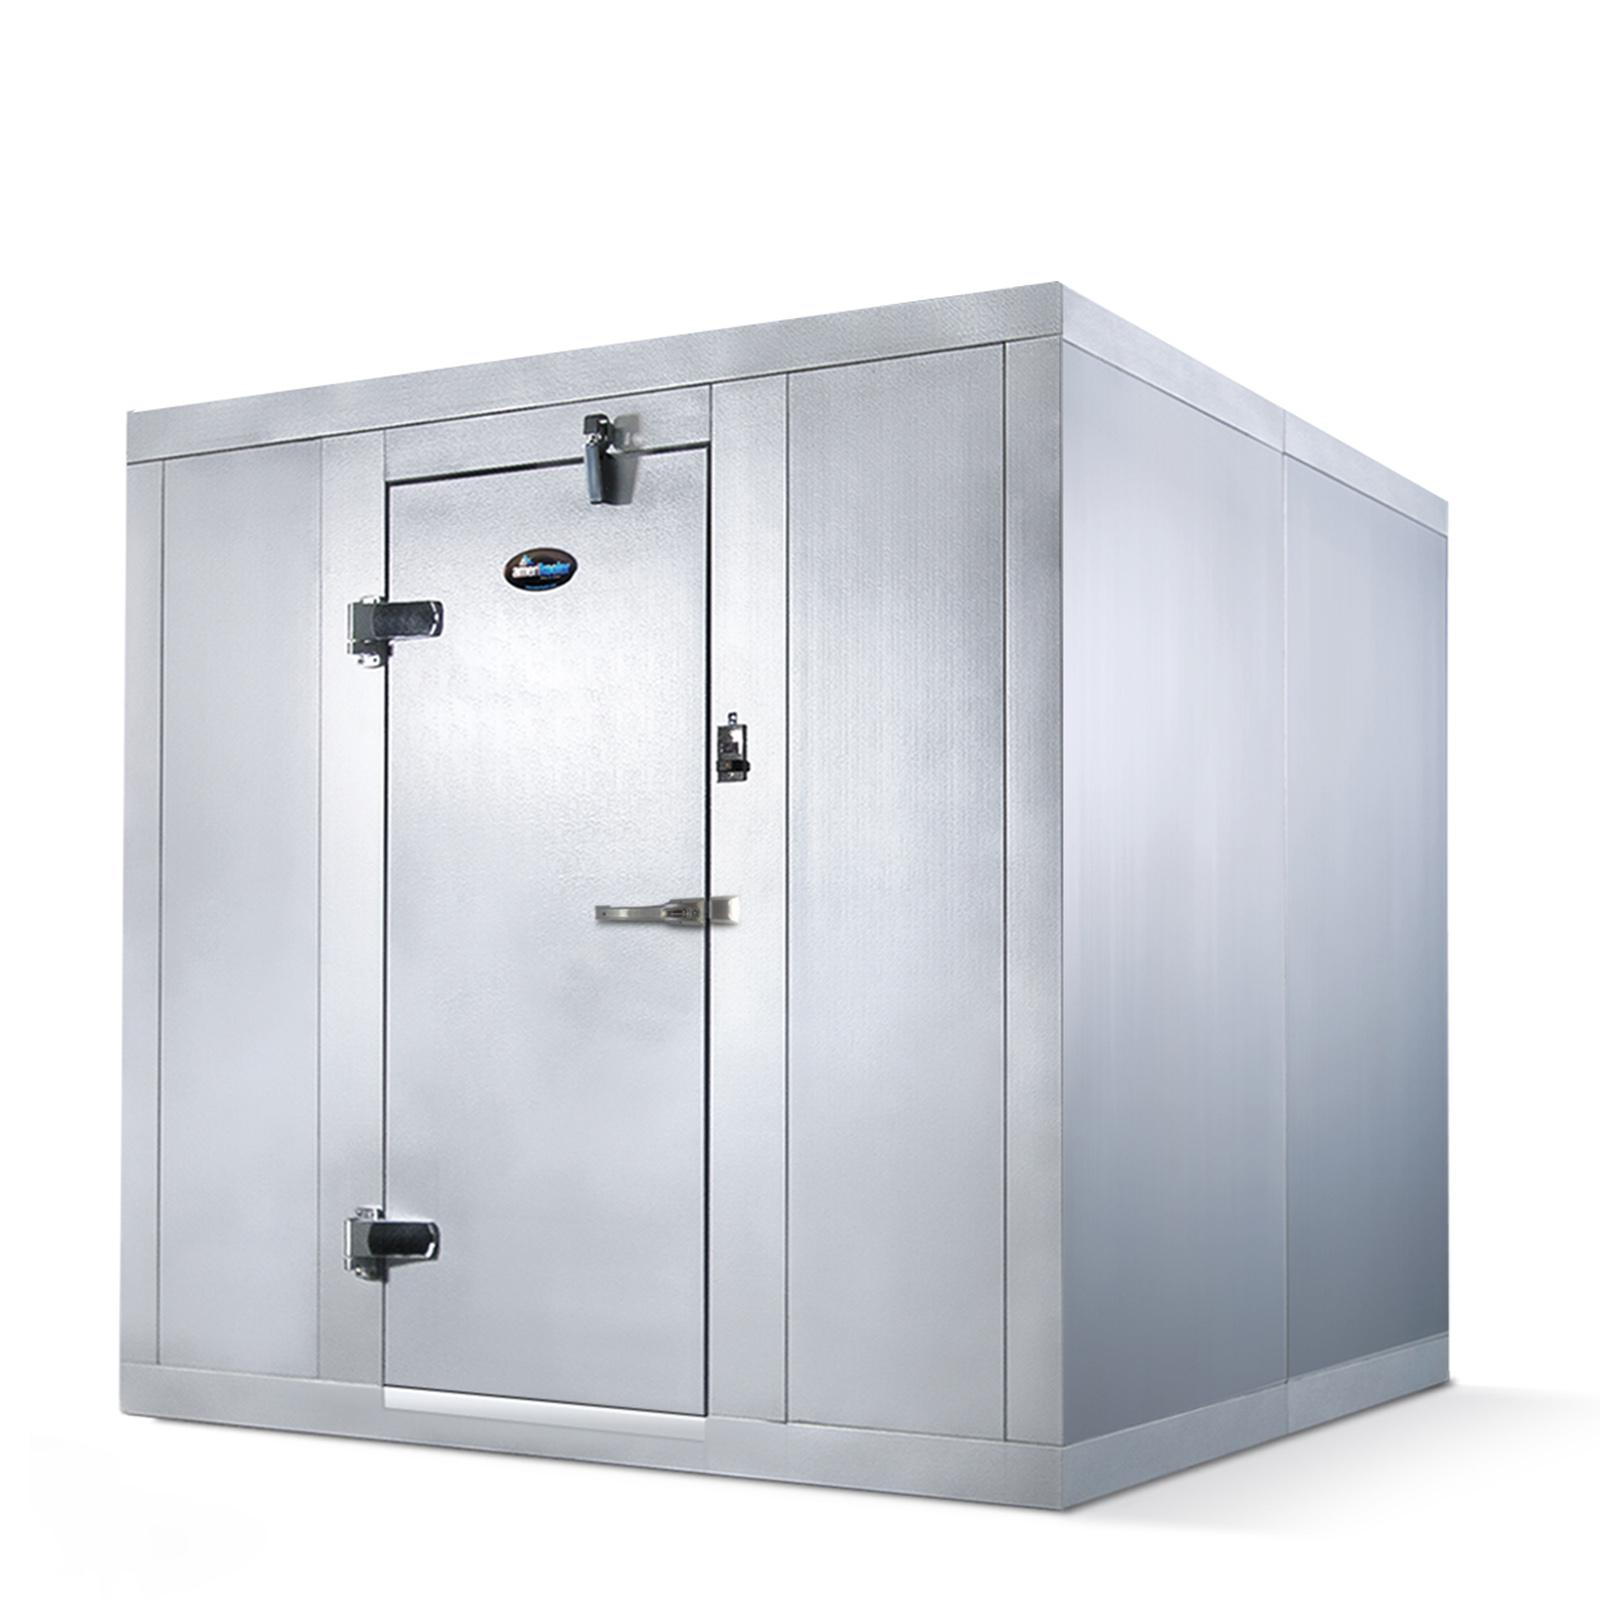 AmeriKooler QC060872**NBRC-O walk in cooler, modular, remote